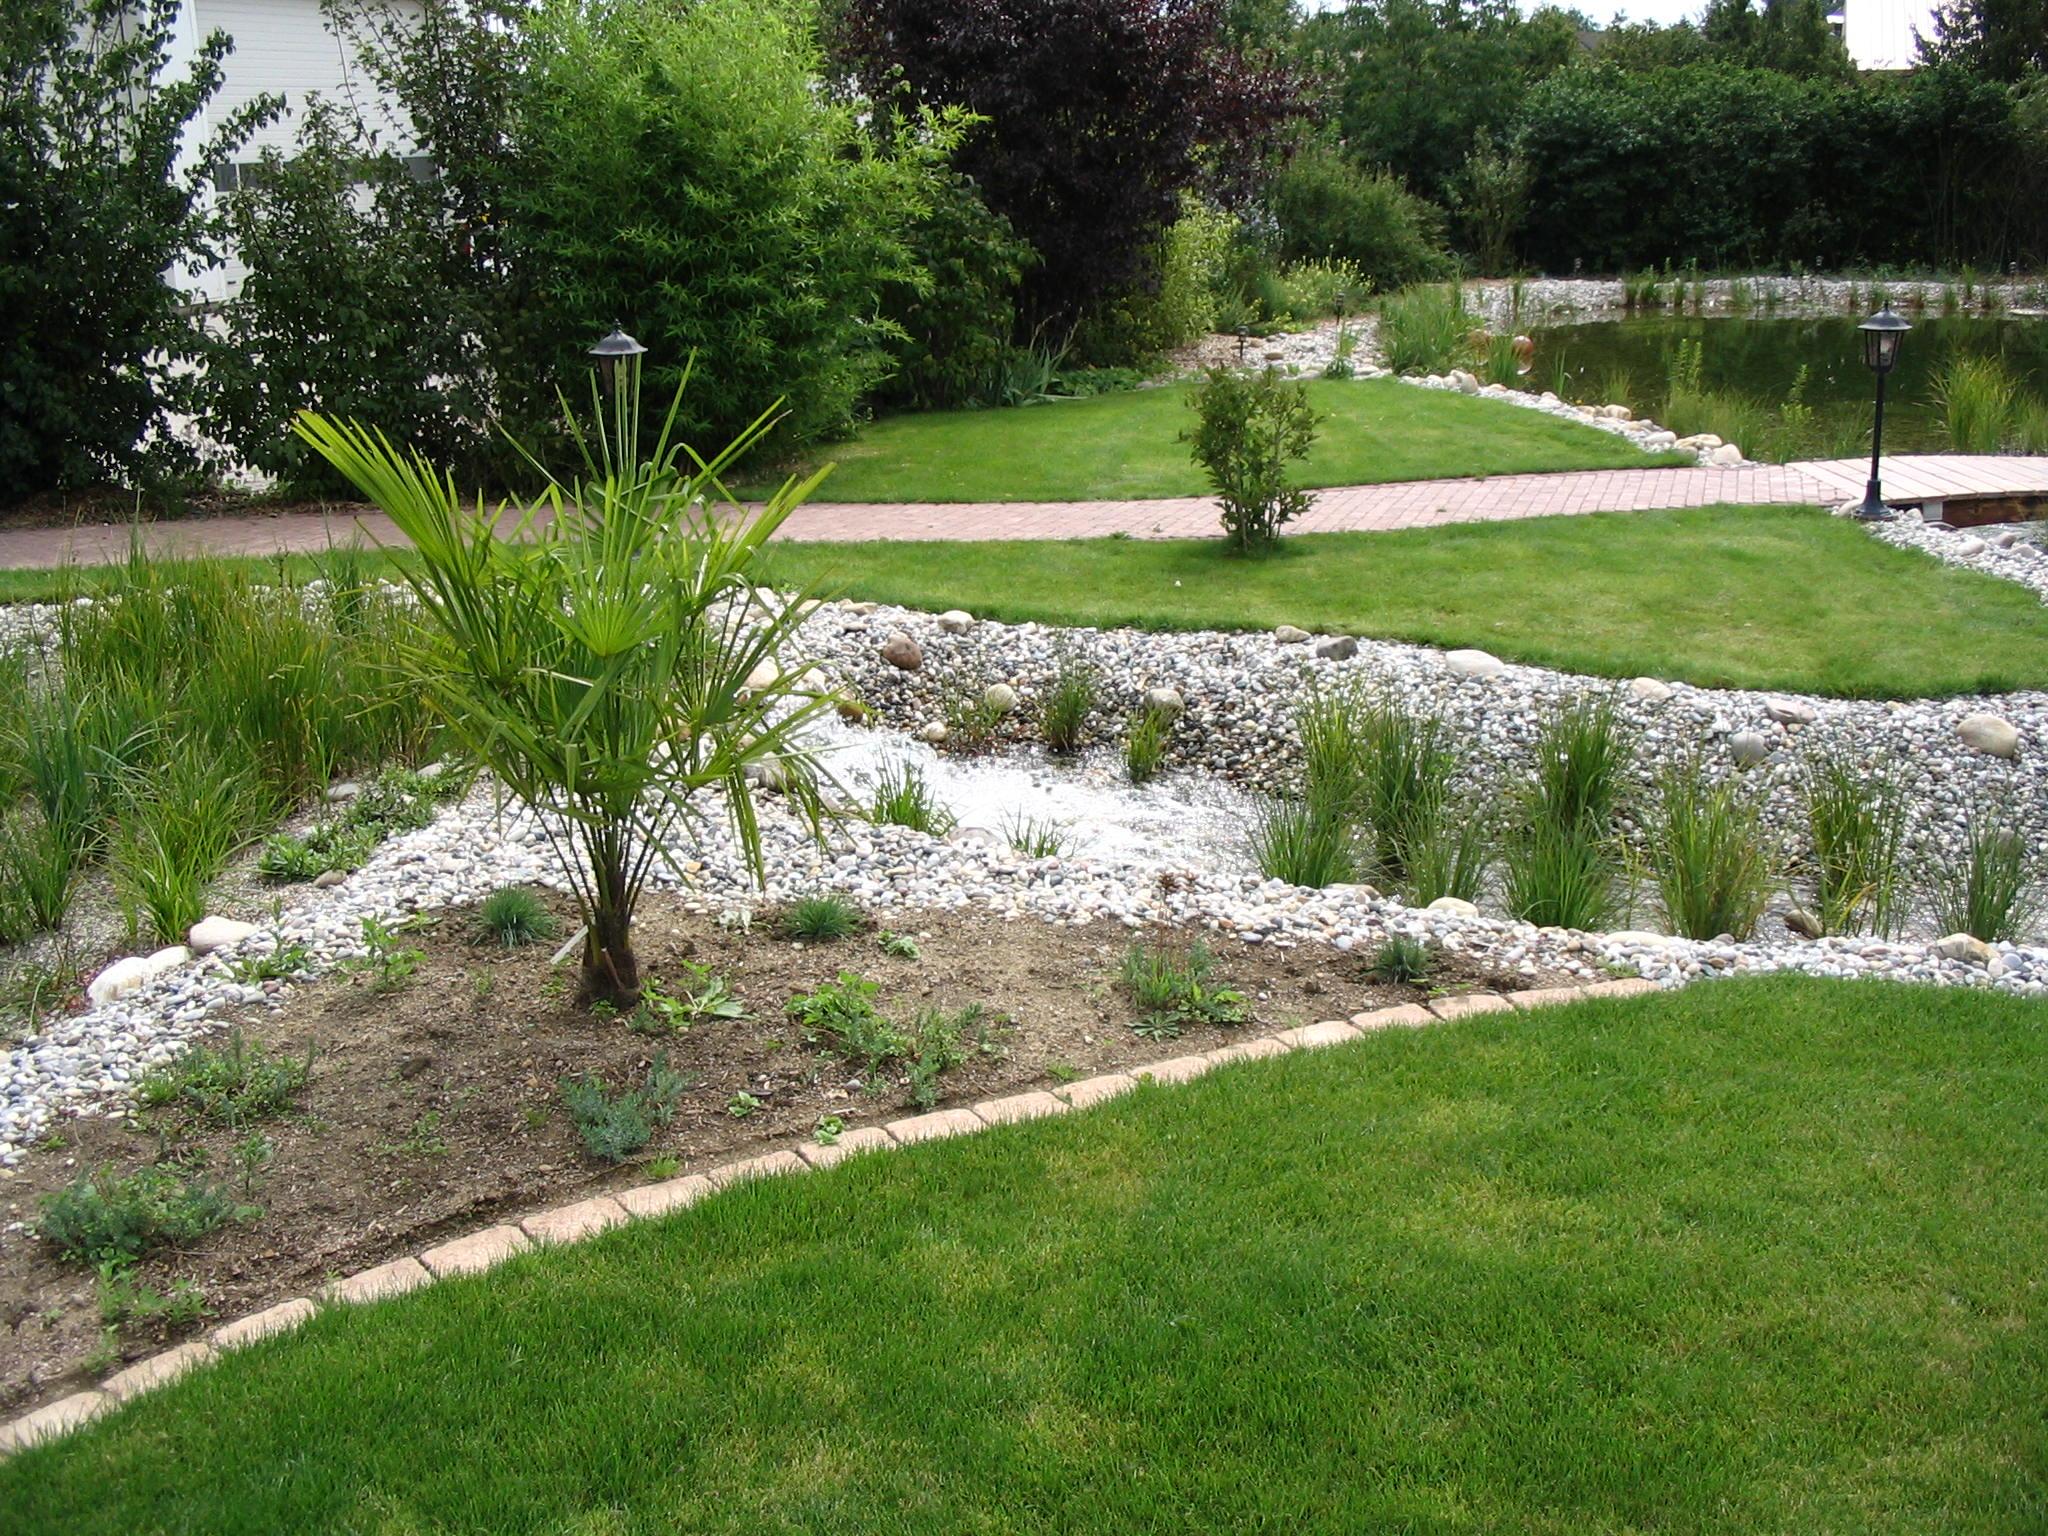 Gartengestaltung aquanatur gmbh for Gartengestaltung app